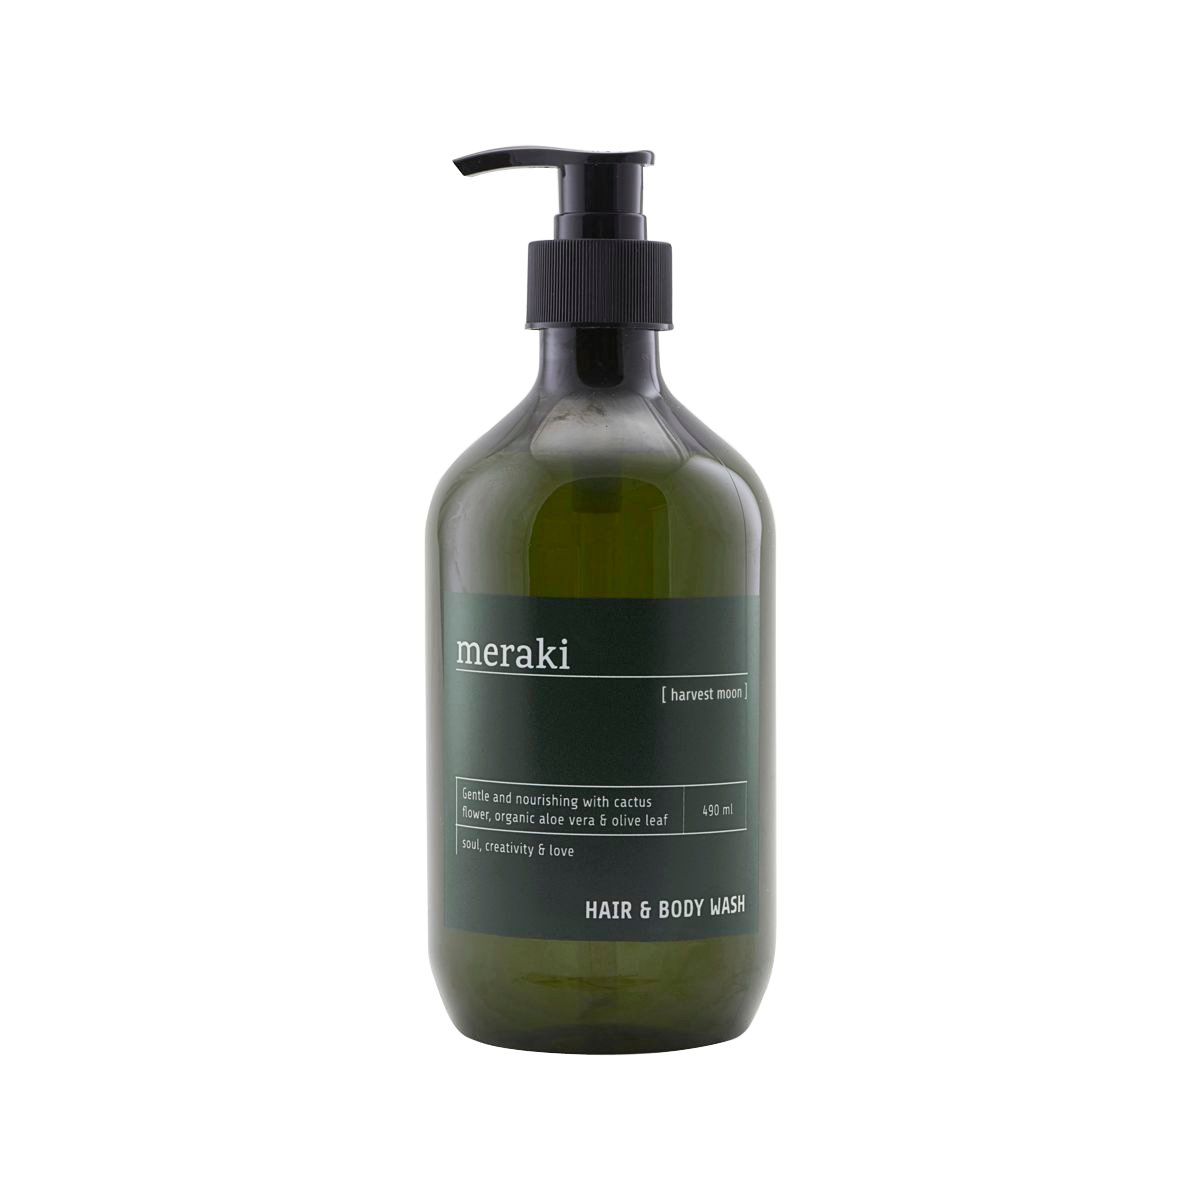 Meraki - Harvest Moon Hair & Body Wash 490 ml (Mkas101/309770101)